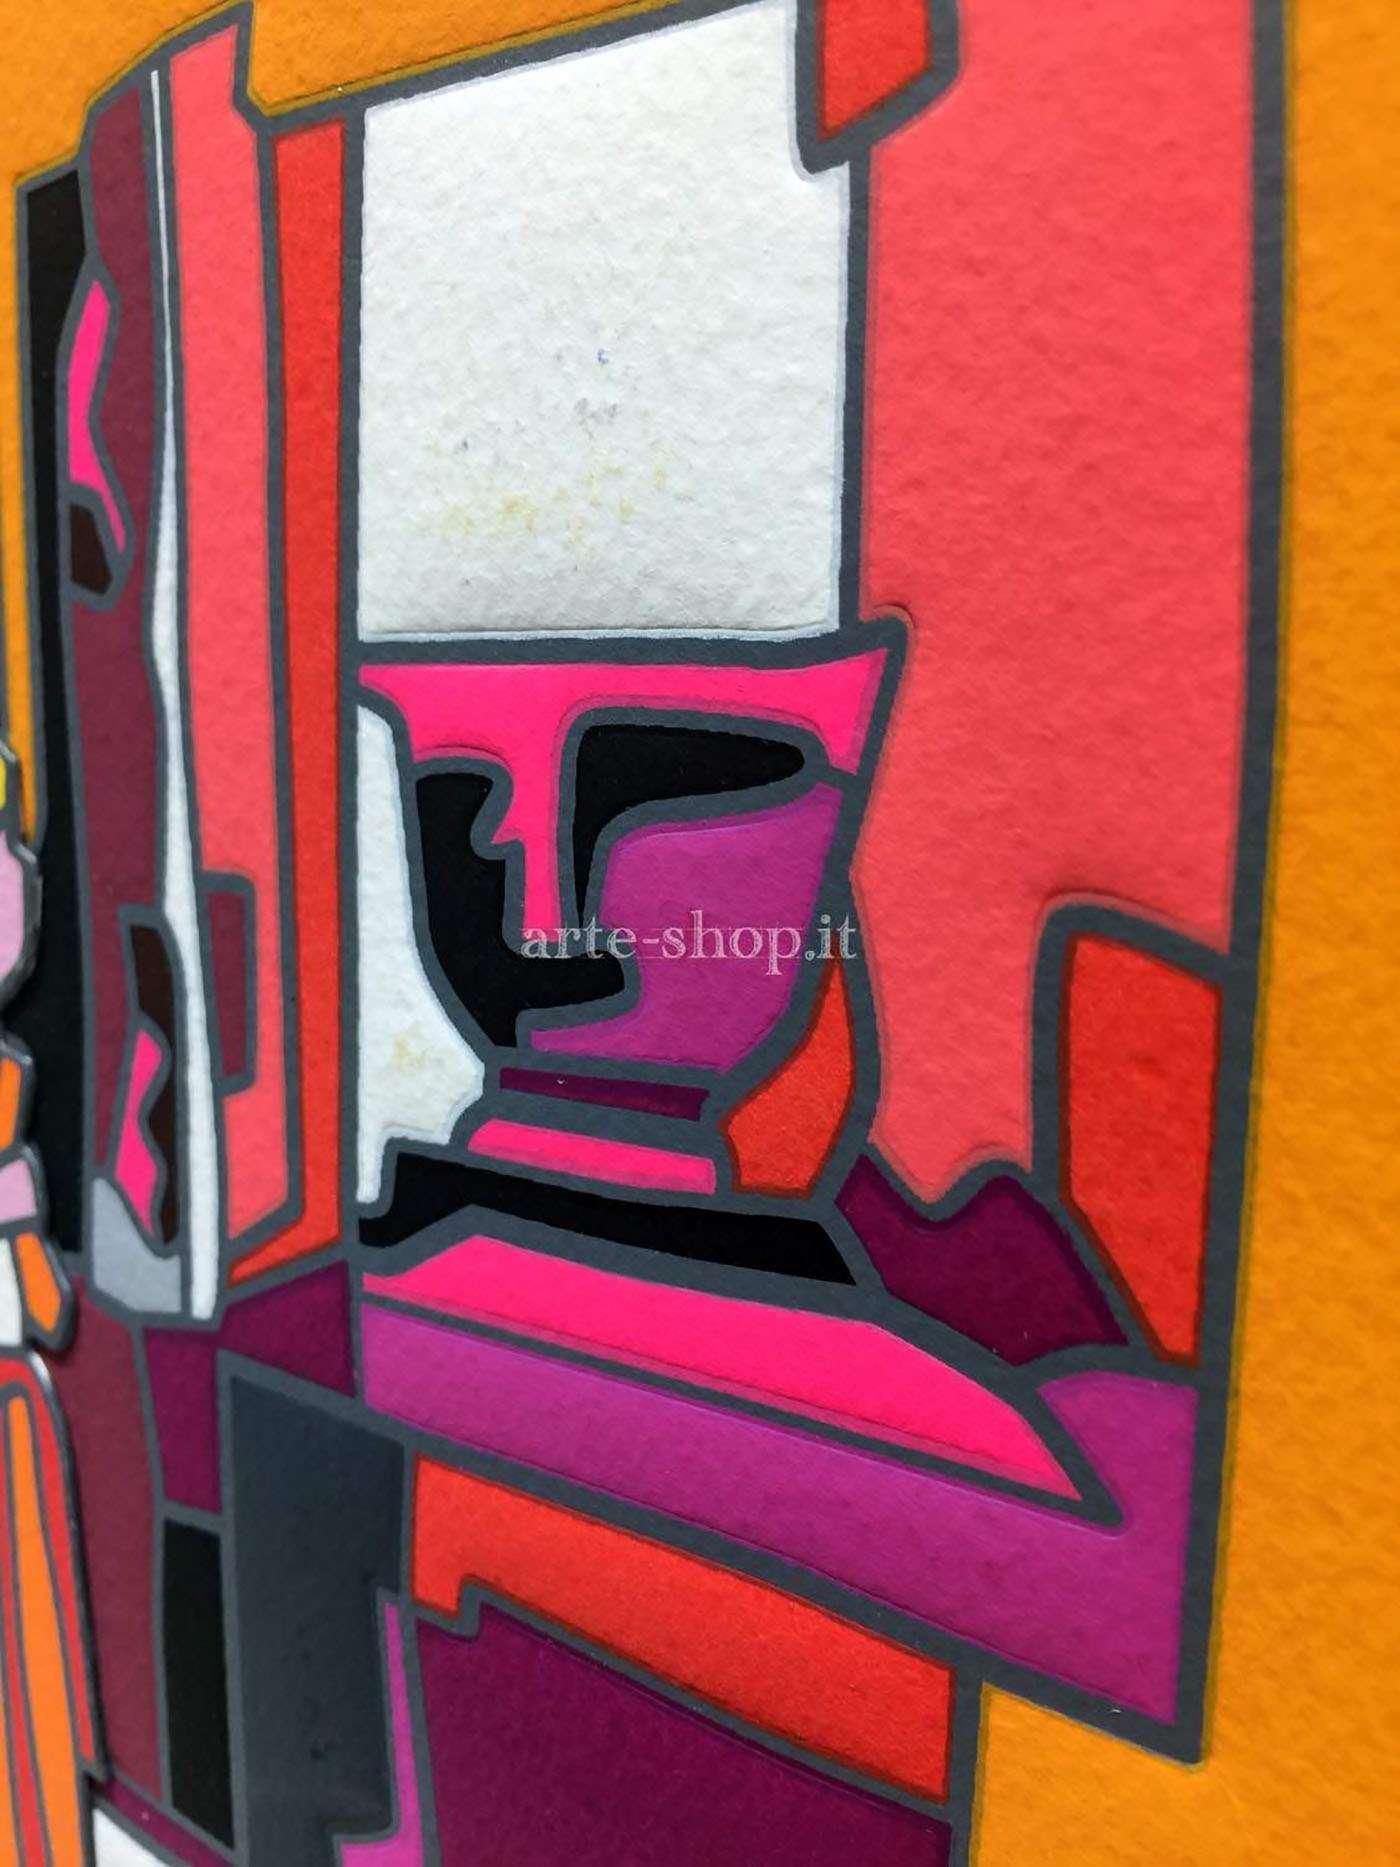 arte pentagono shop dettaglio numero 405